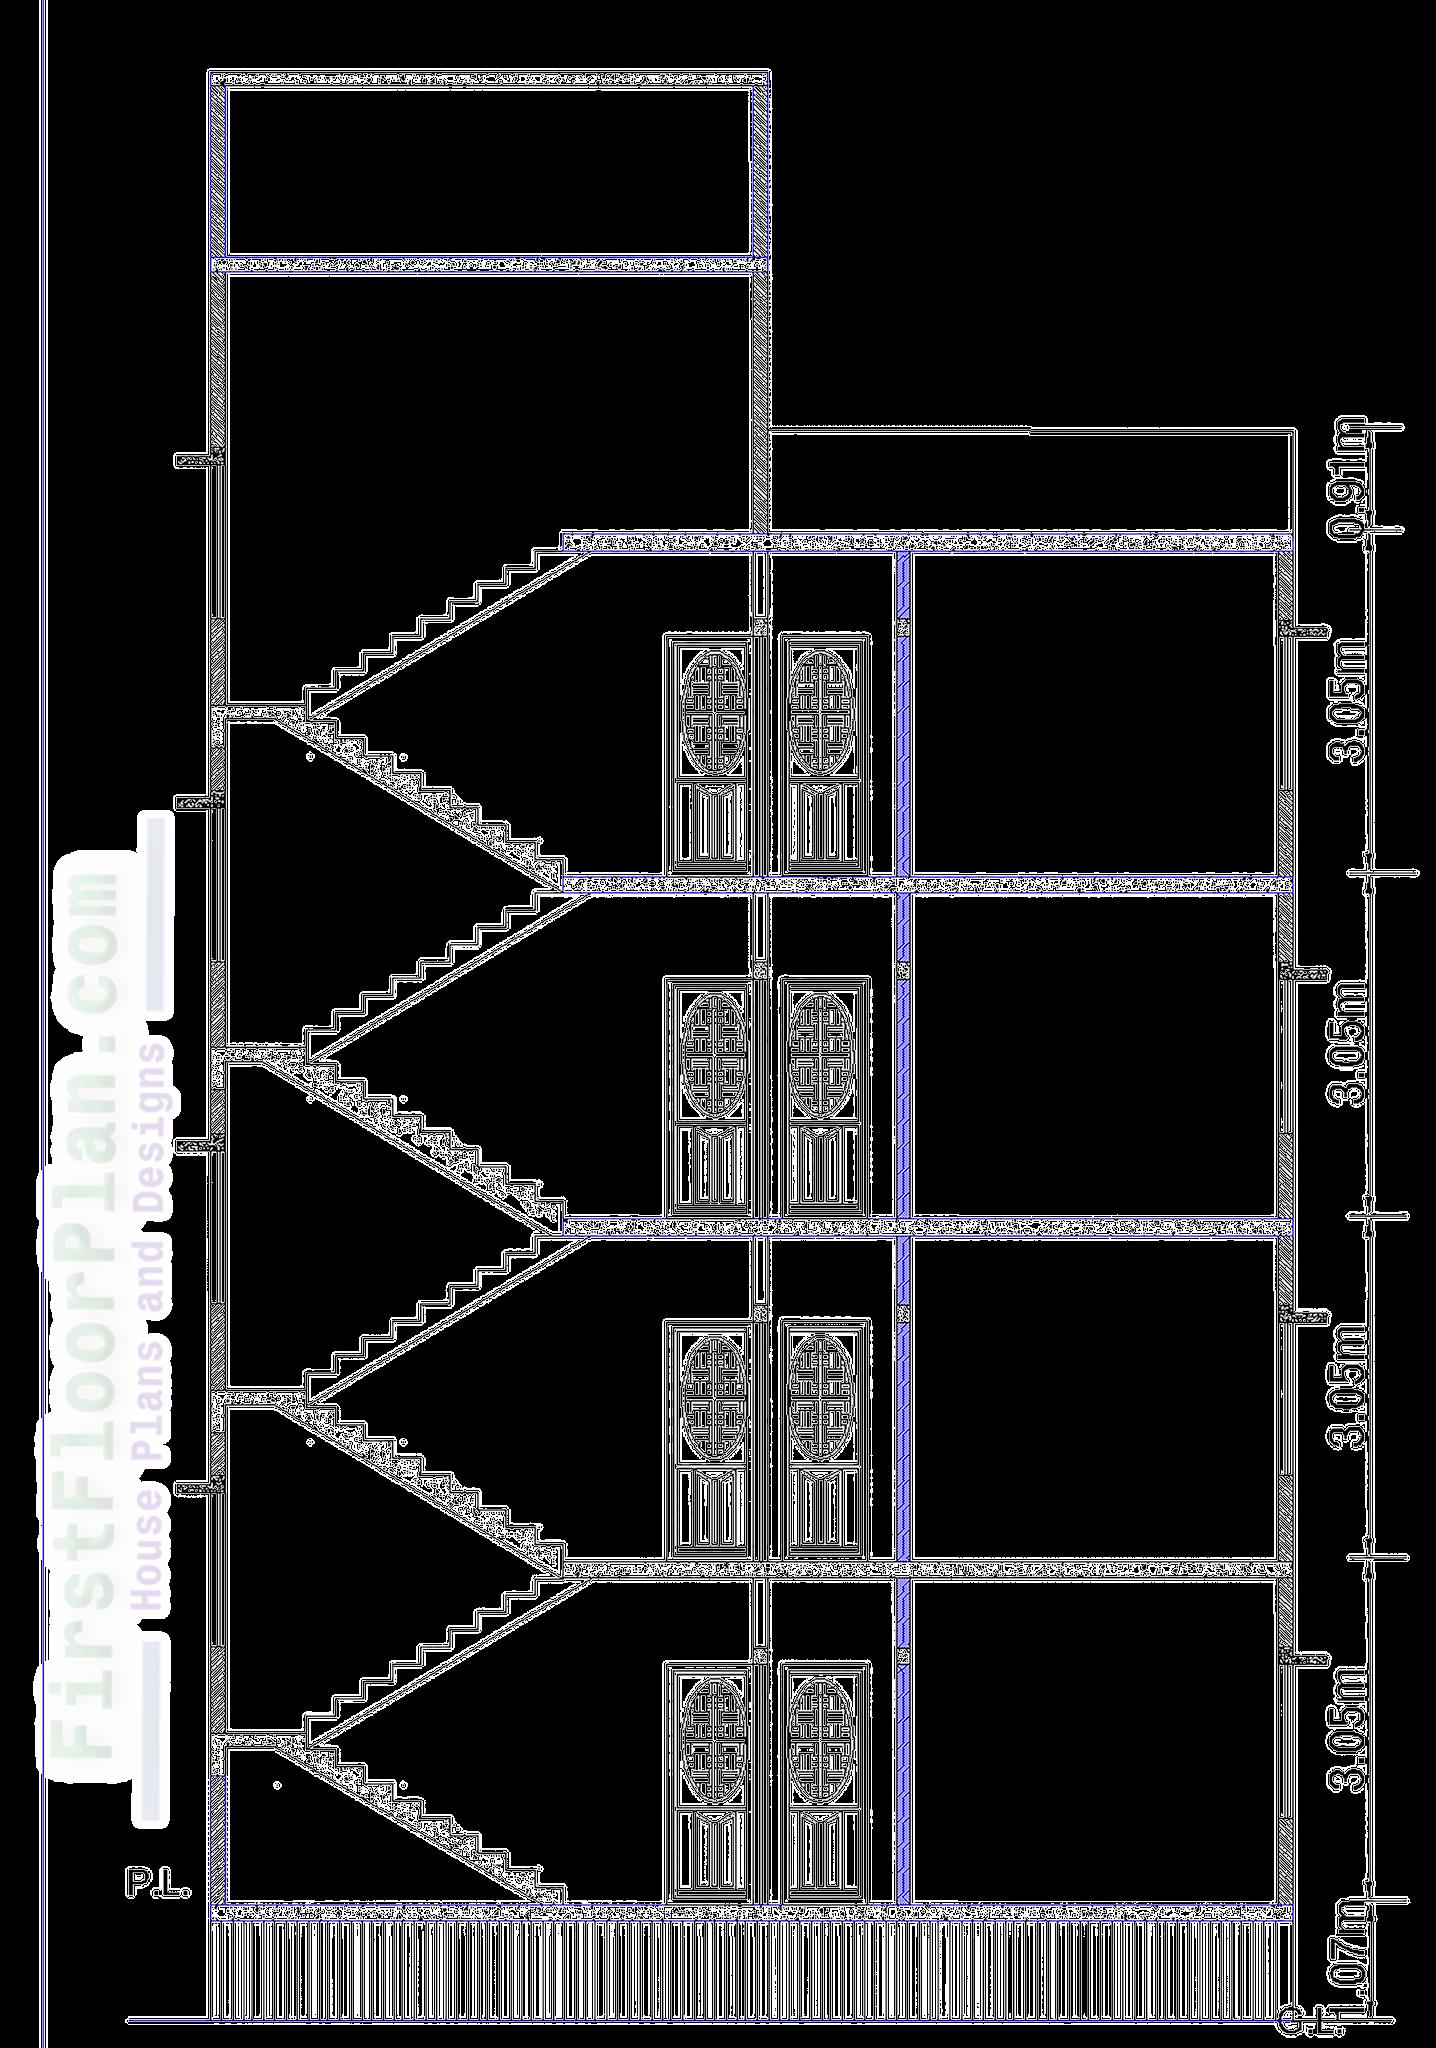 Four storey building Section Autocad file